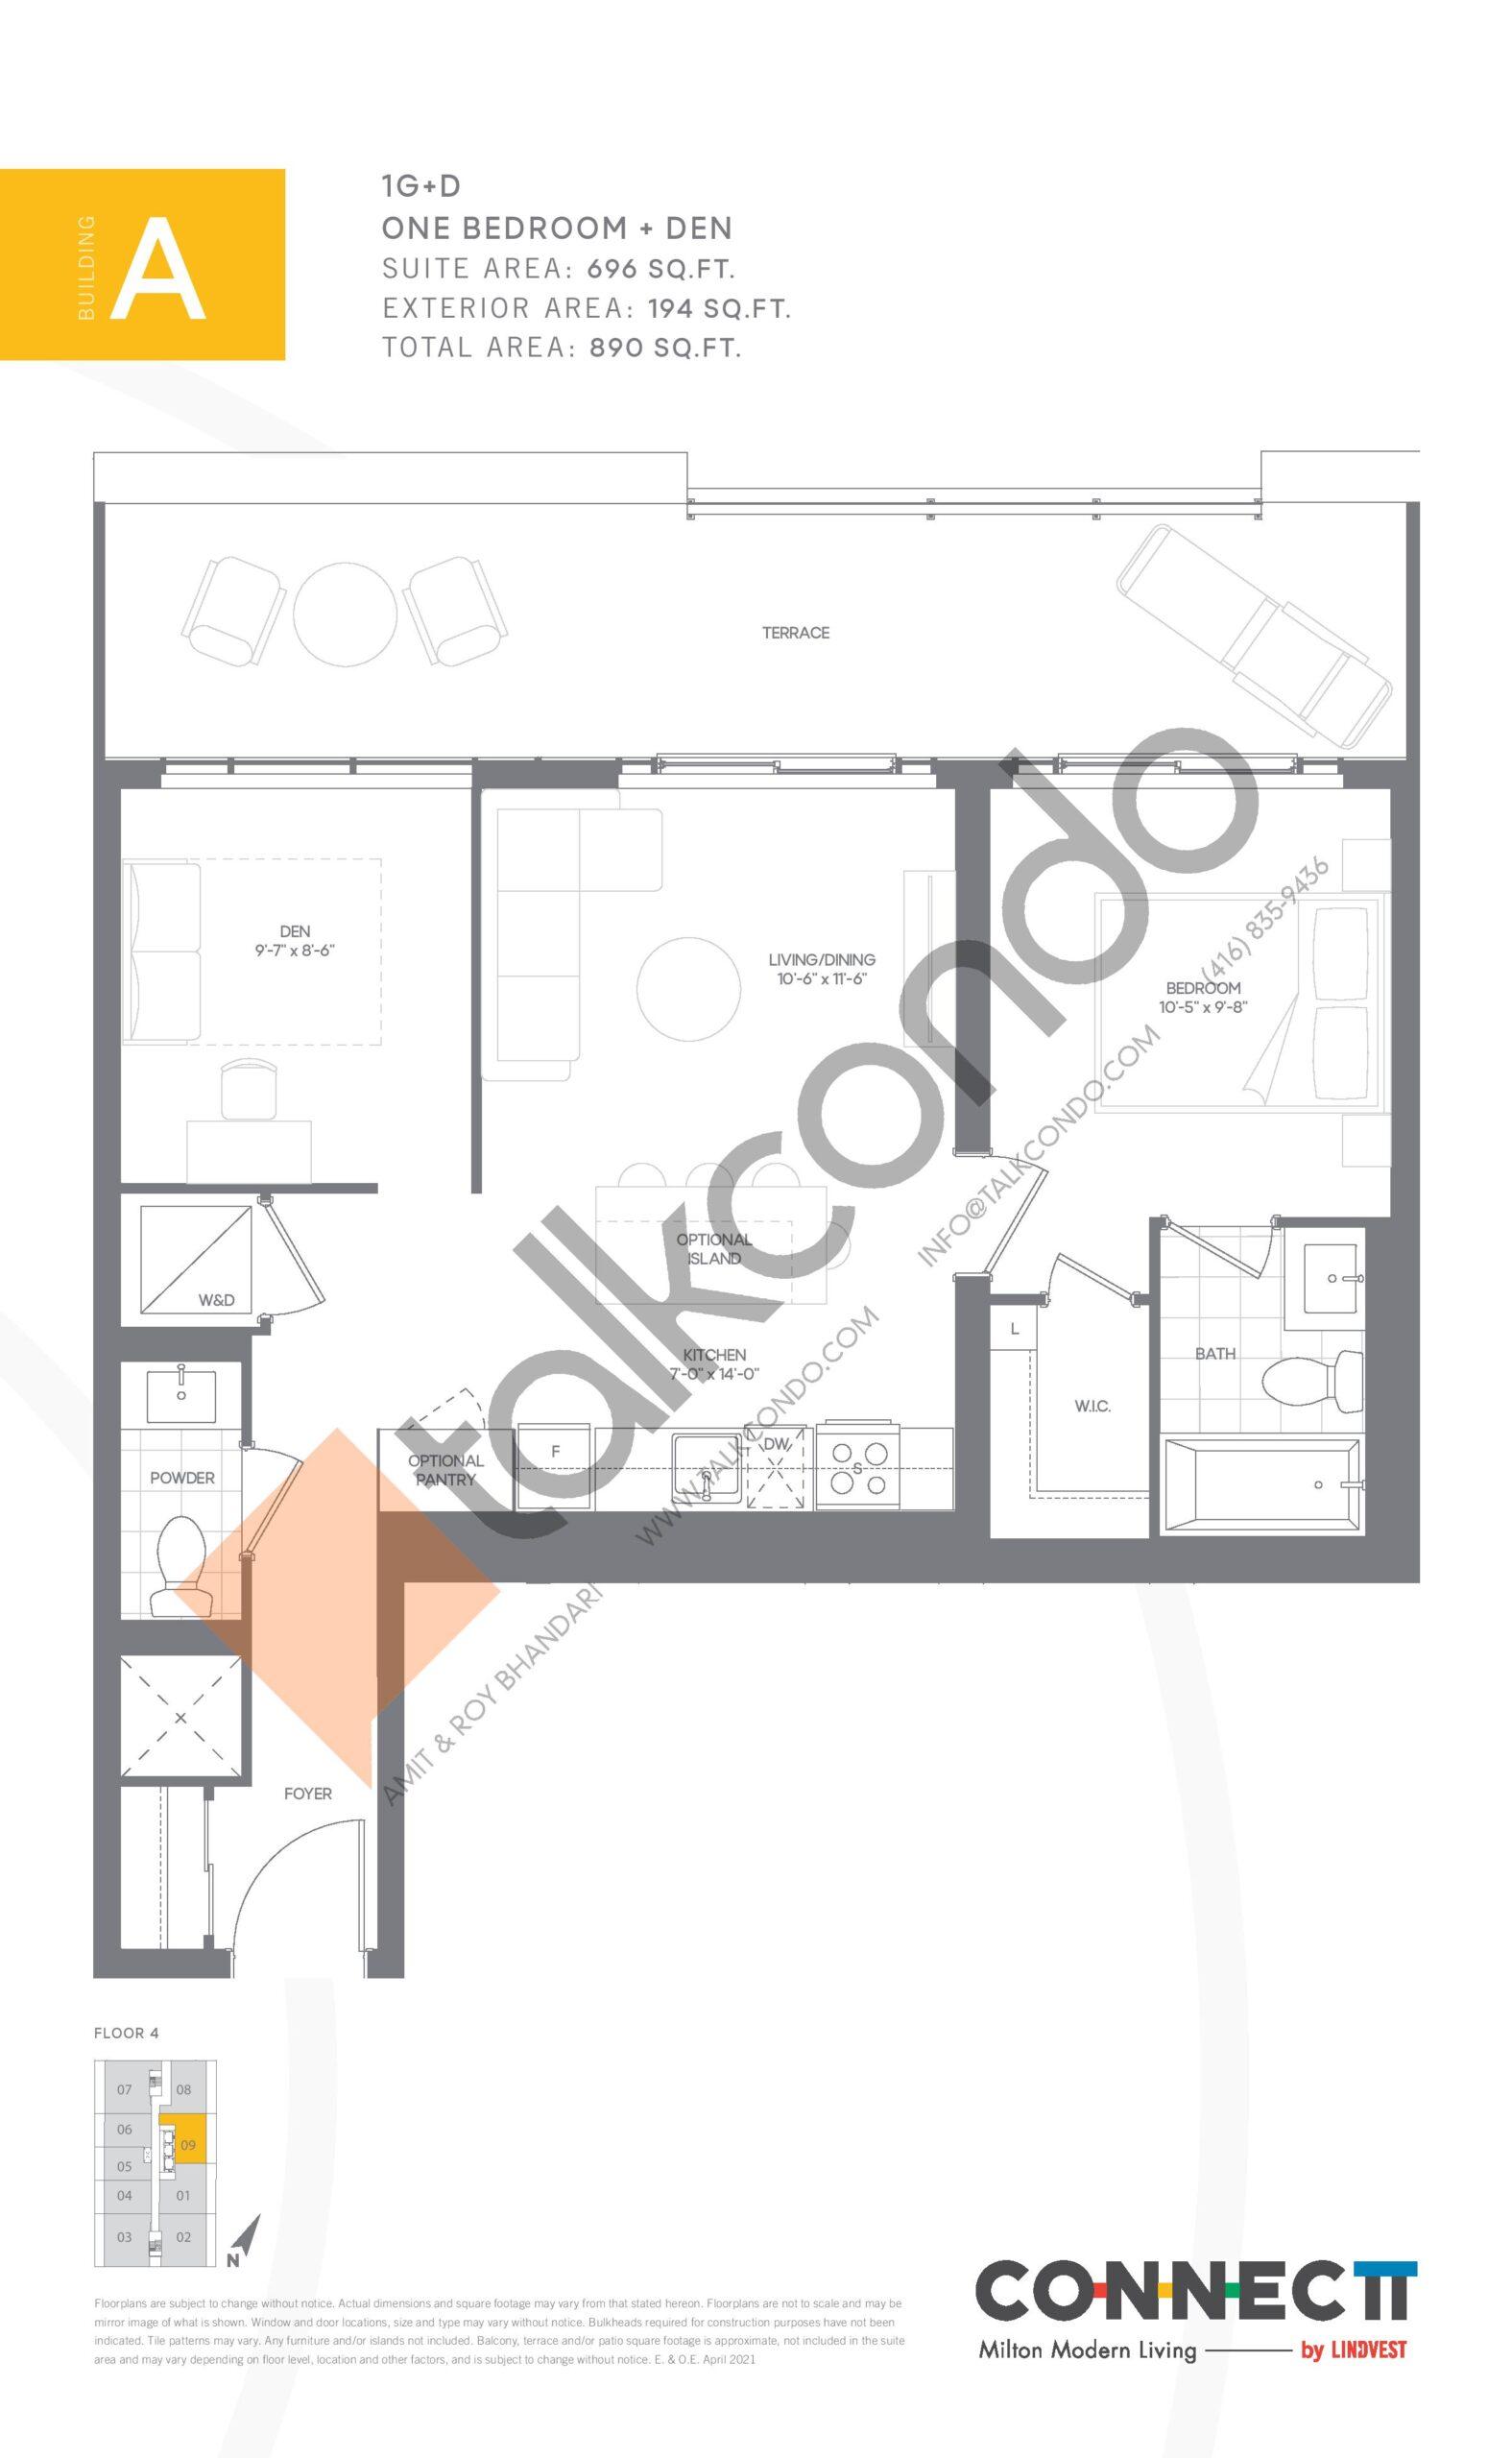 1G+D Floor Plan at Connectt Urban Community Condos - 696 sq.ft